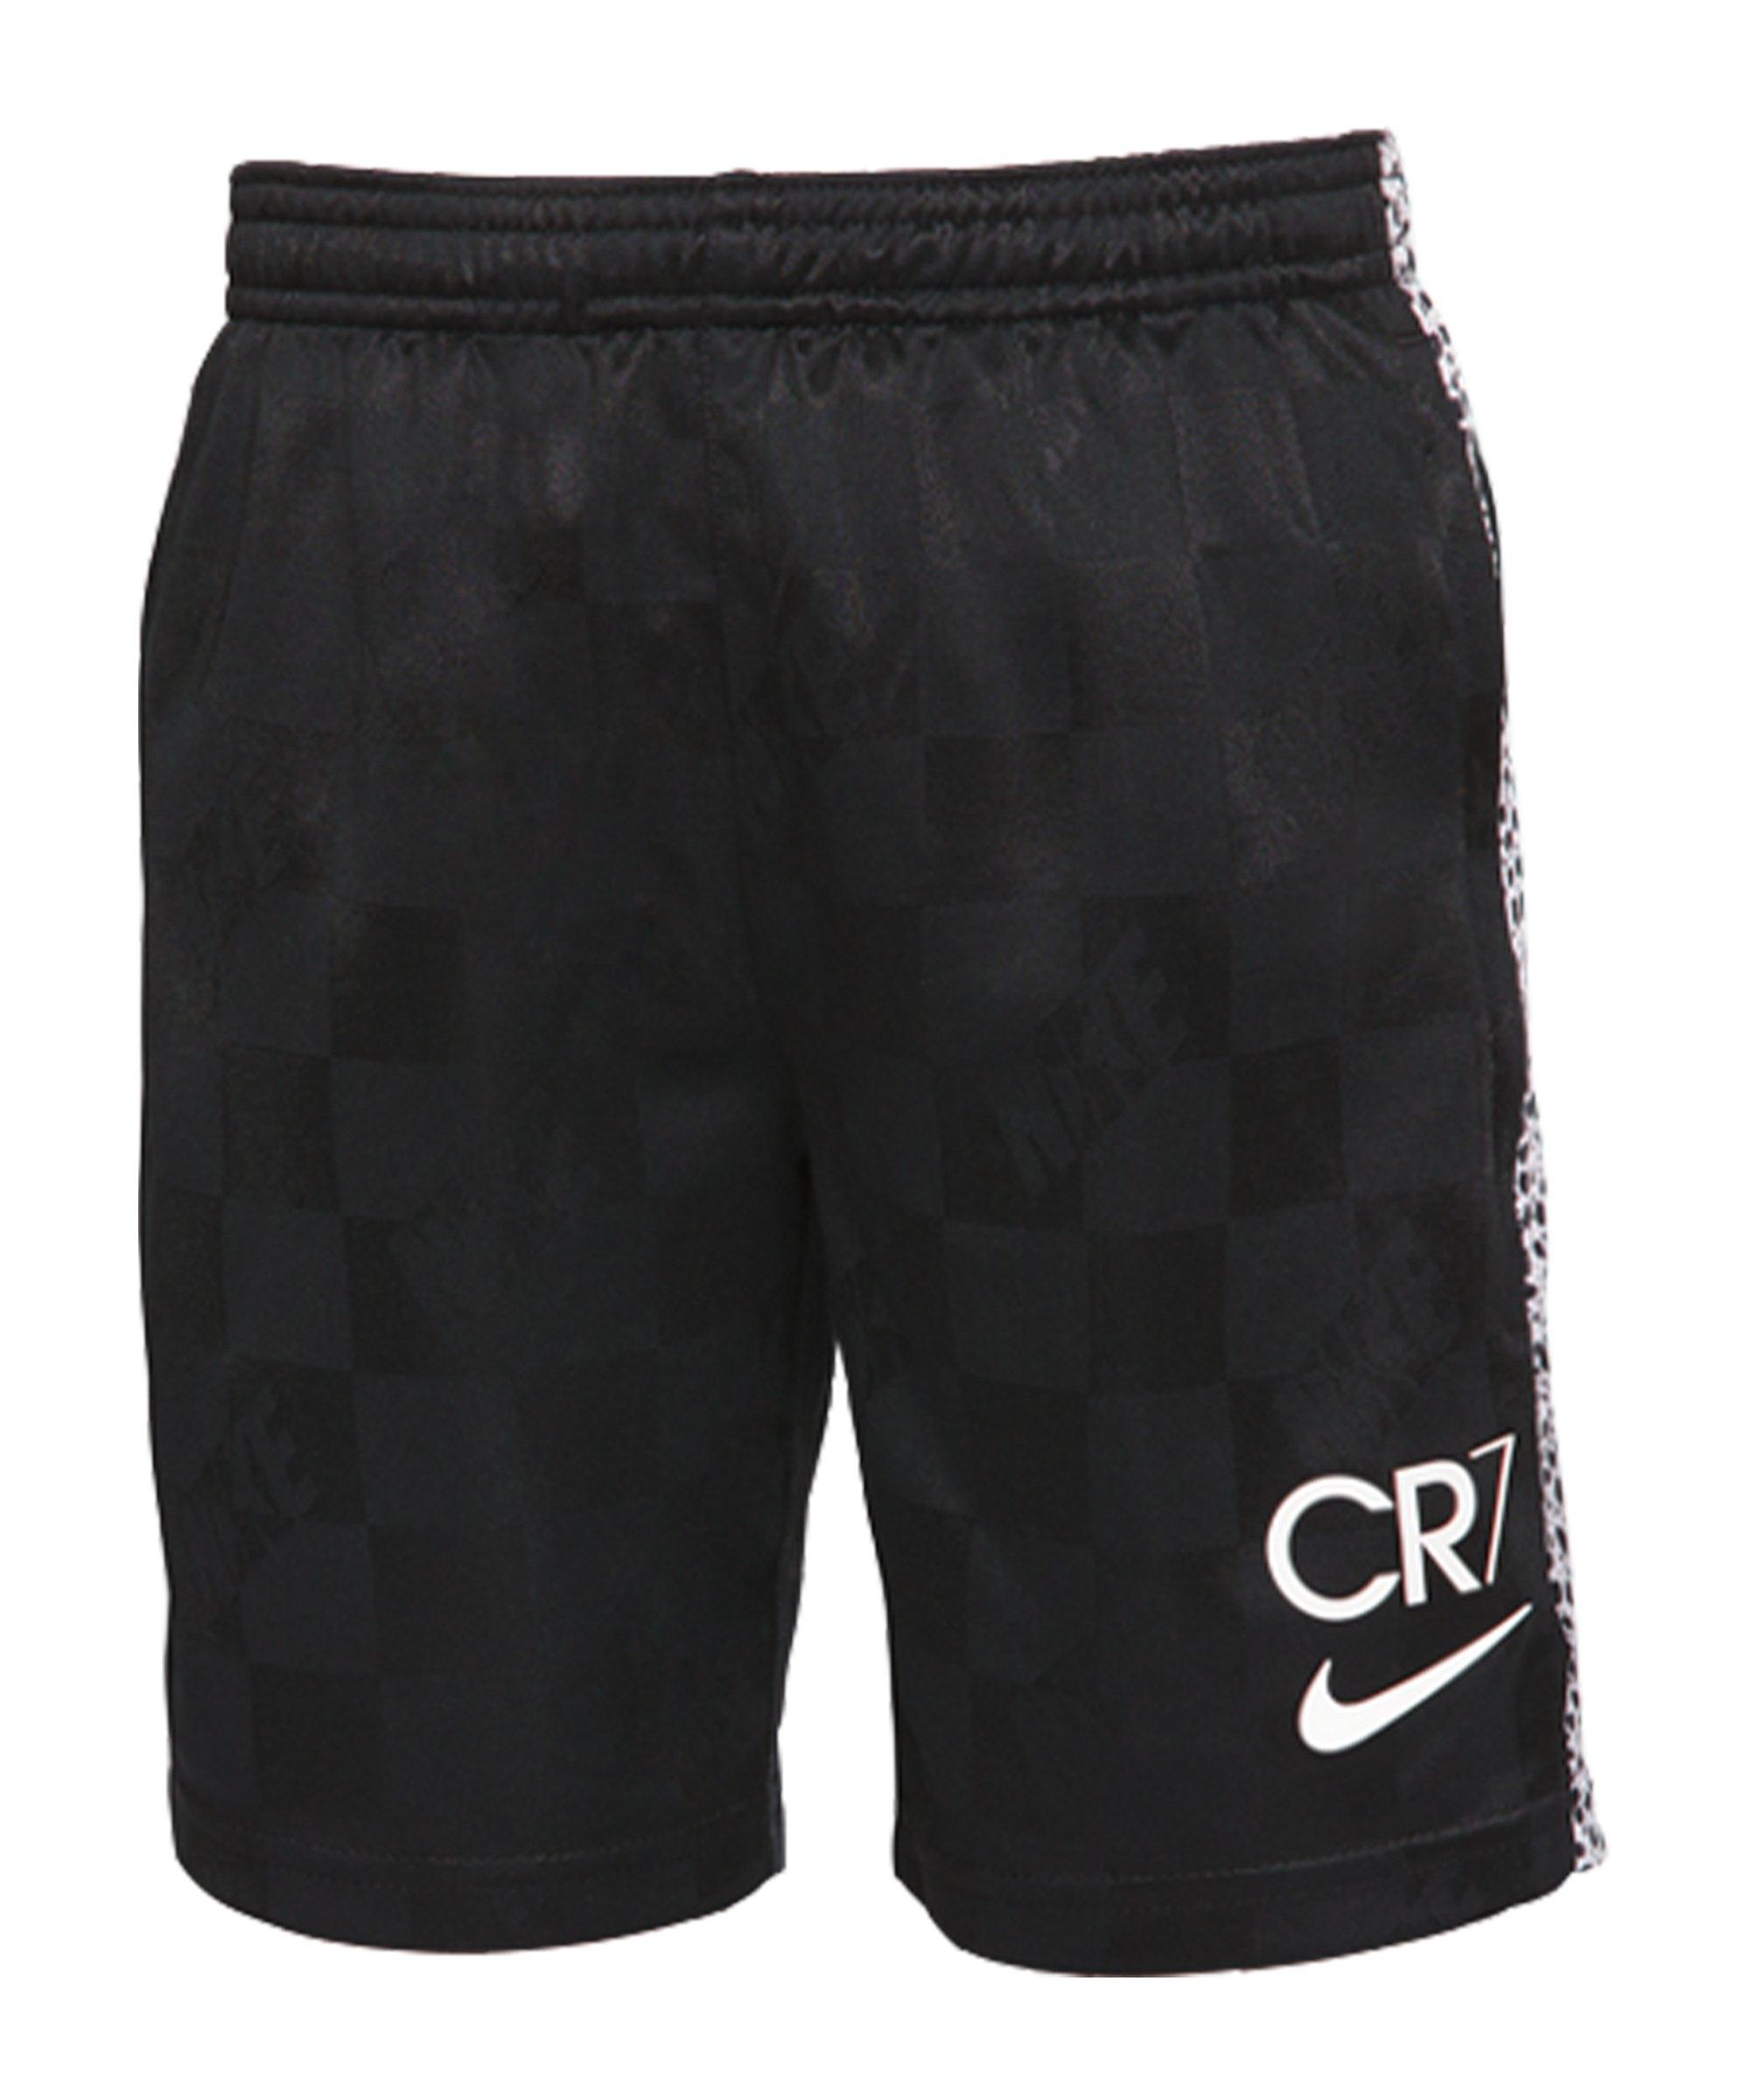 Nike CR7 Short Kids Schwarz F010 - schwarz